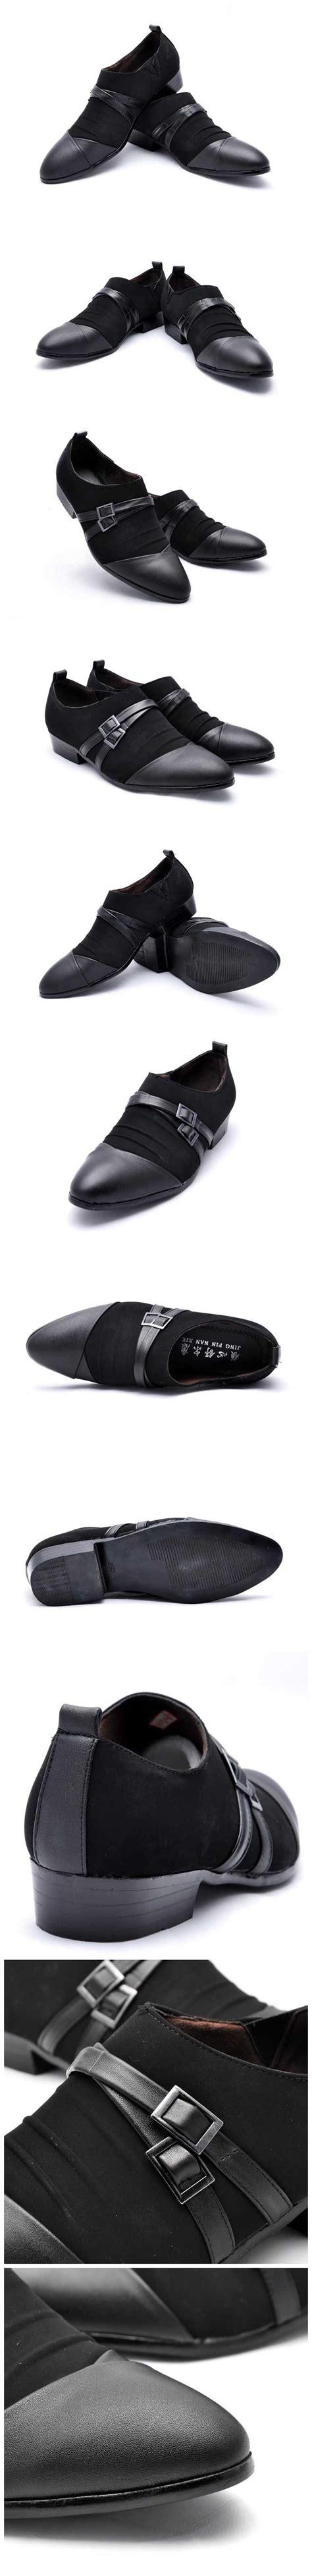 Sepatu Ori Bahan Bludru jual sepatu formal pria